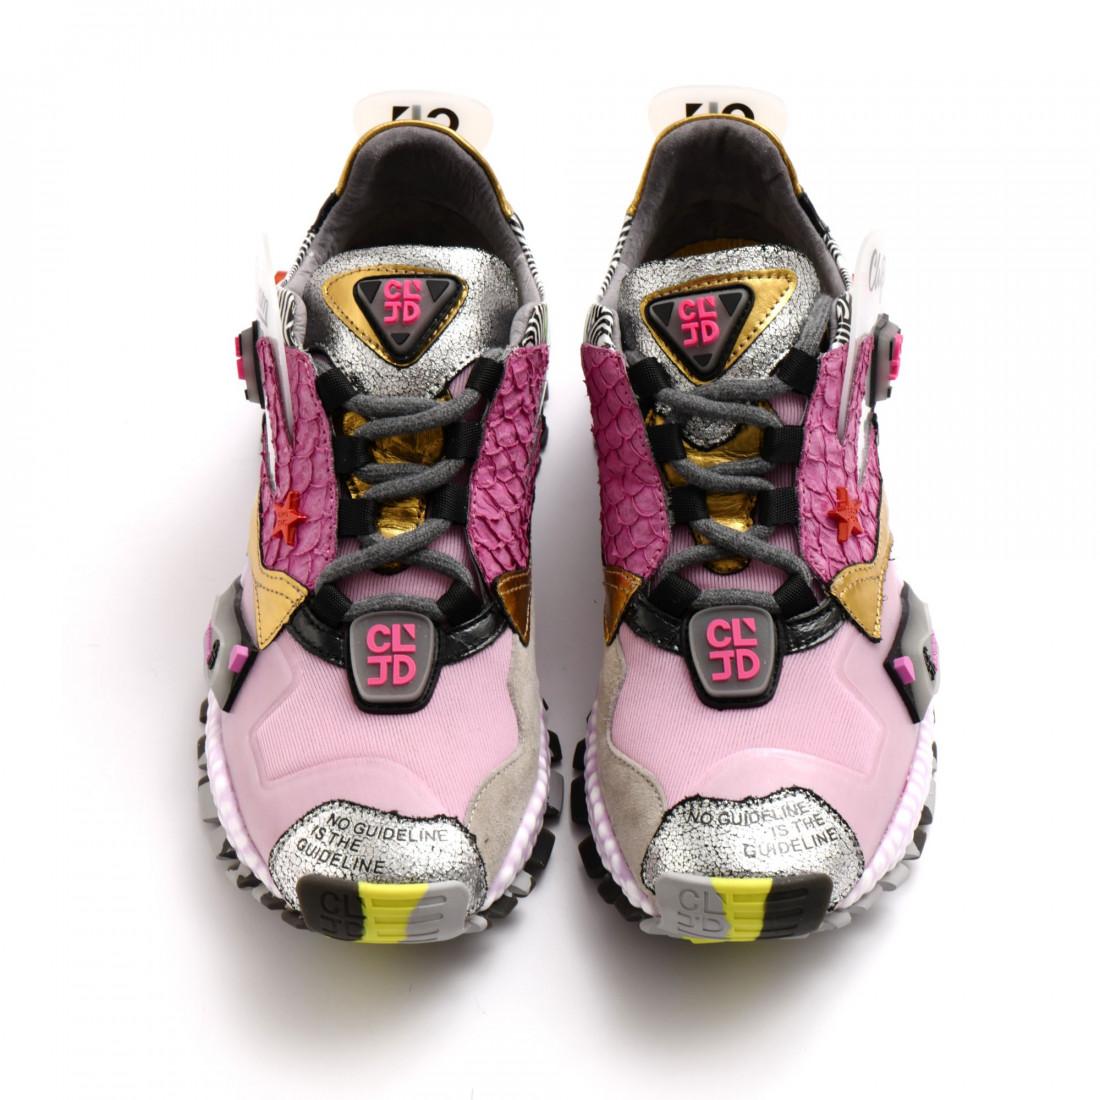 sneakers woman cljd 6f0300121 pink violet 8141